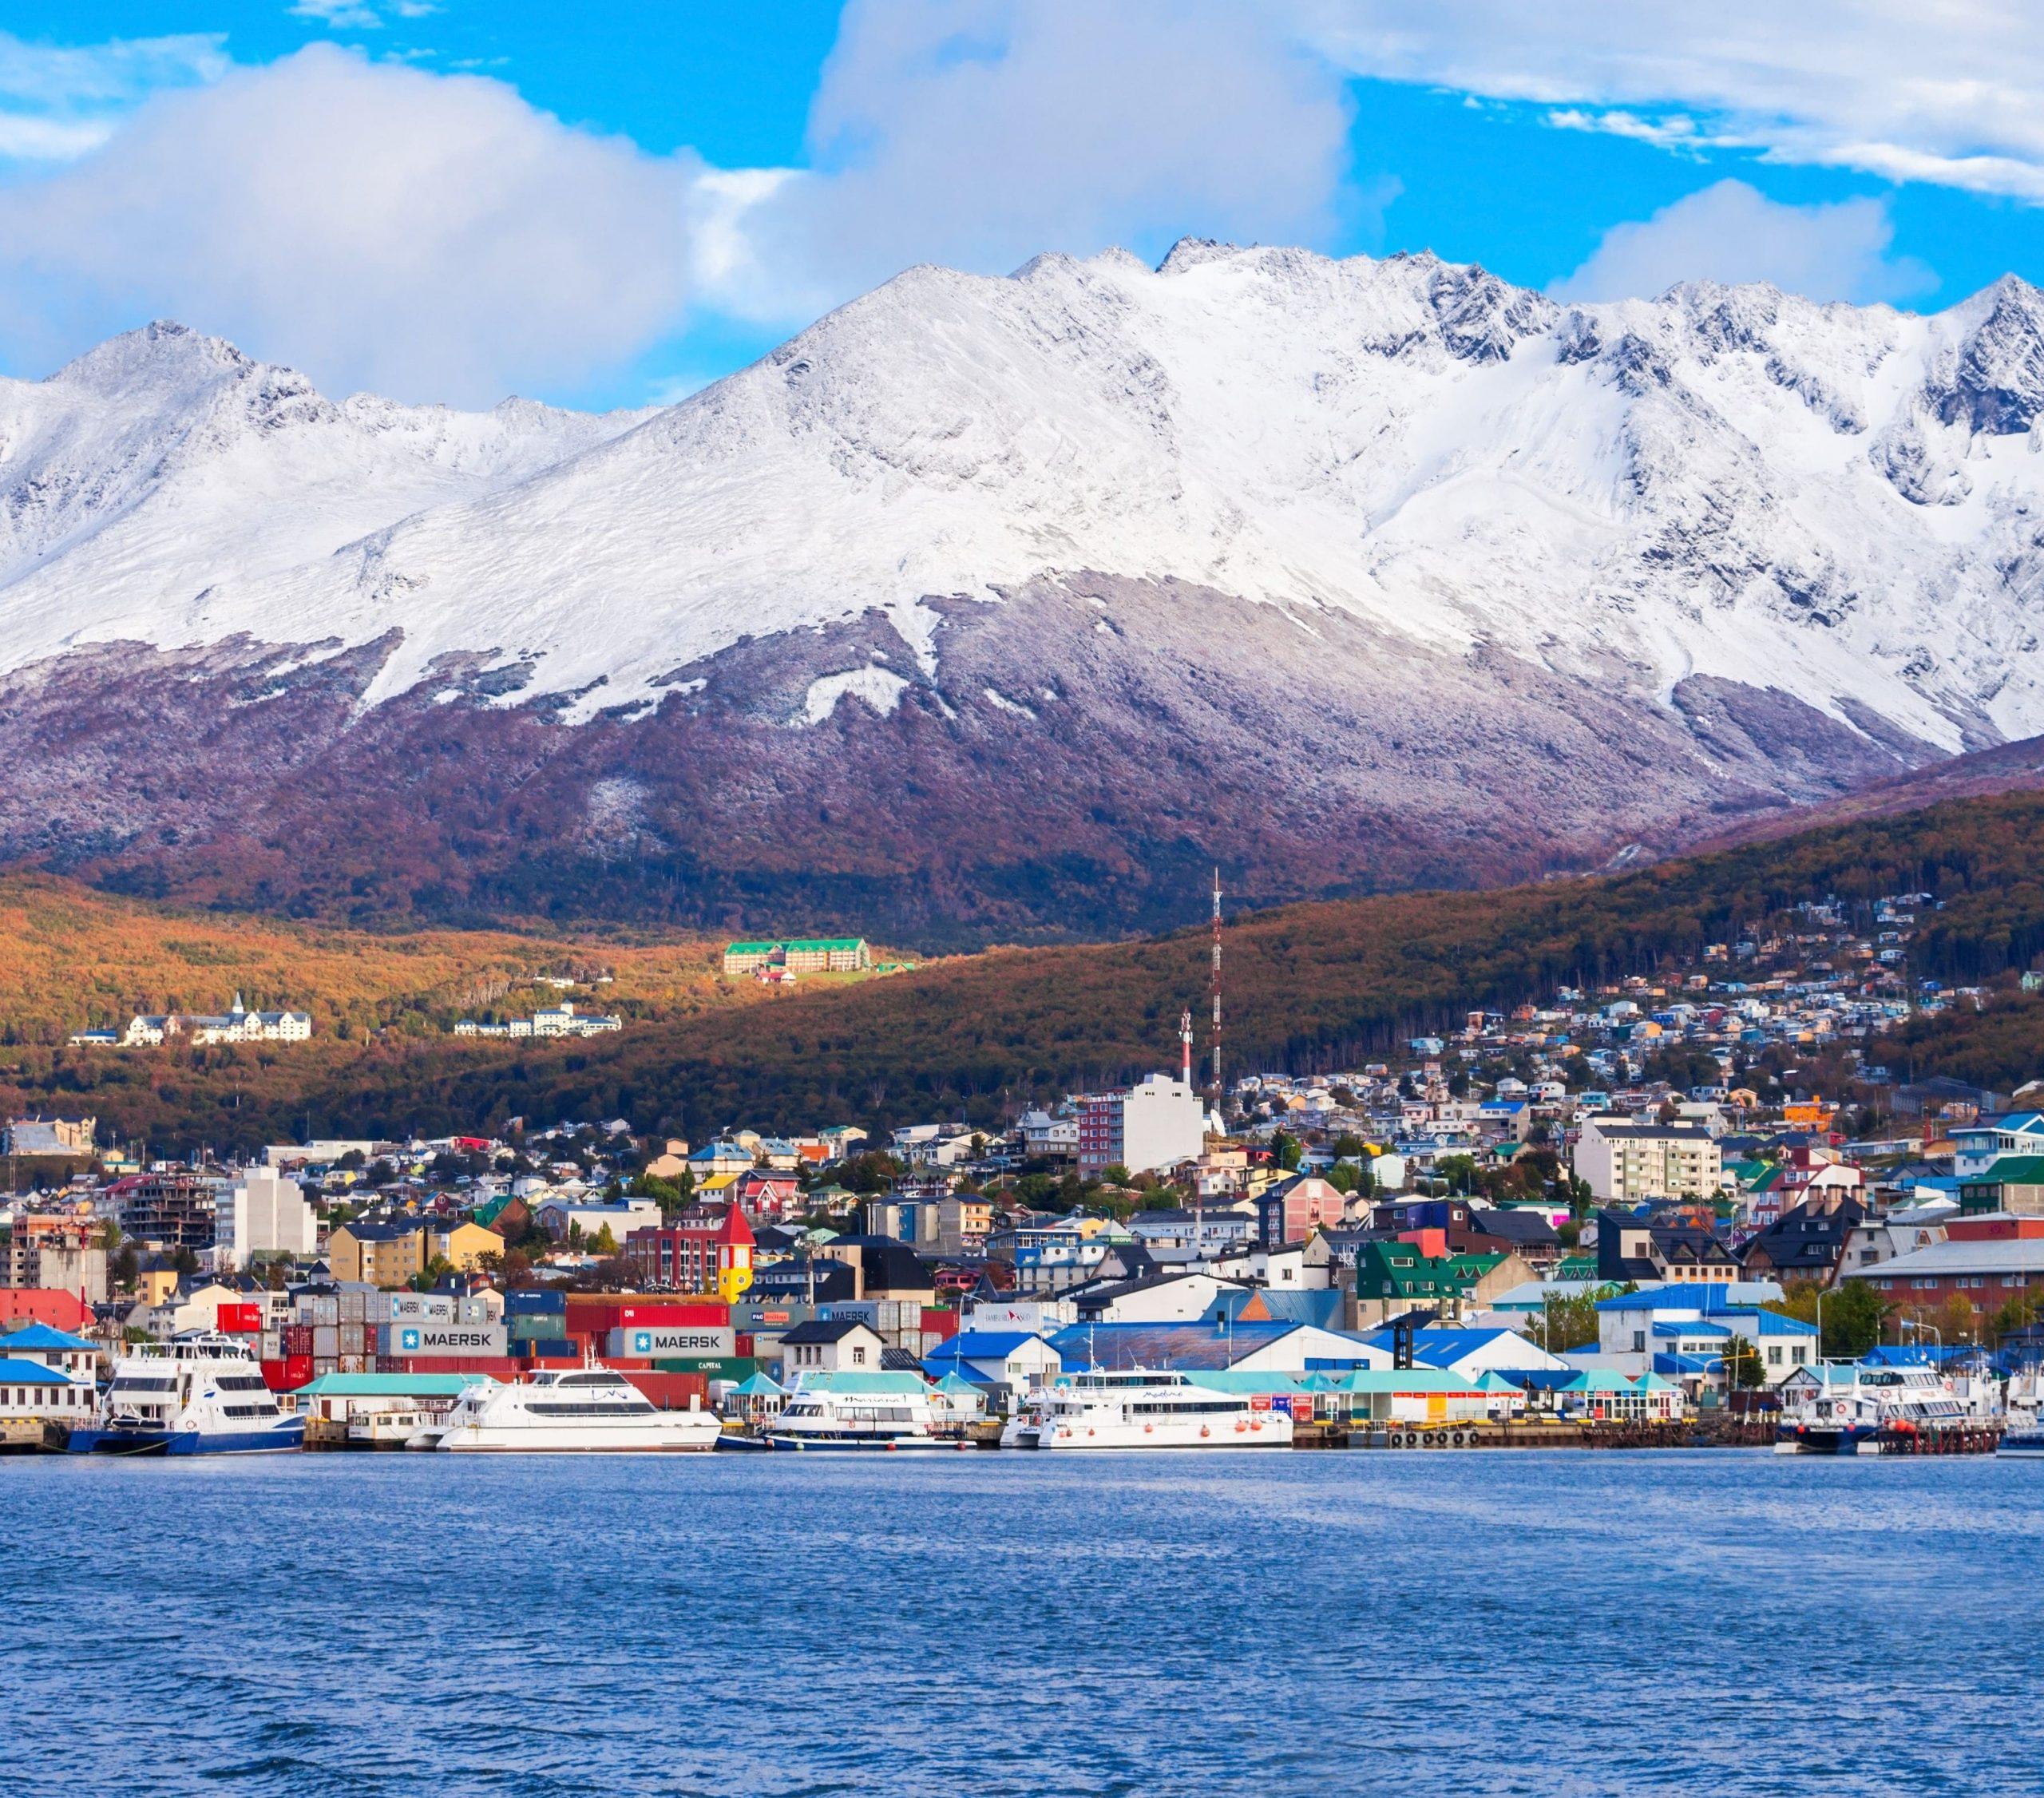 Ushuaïa argentine